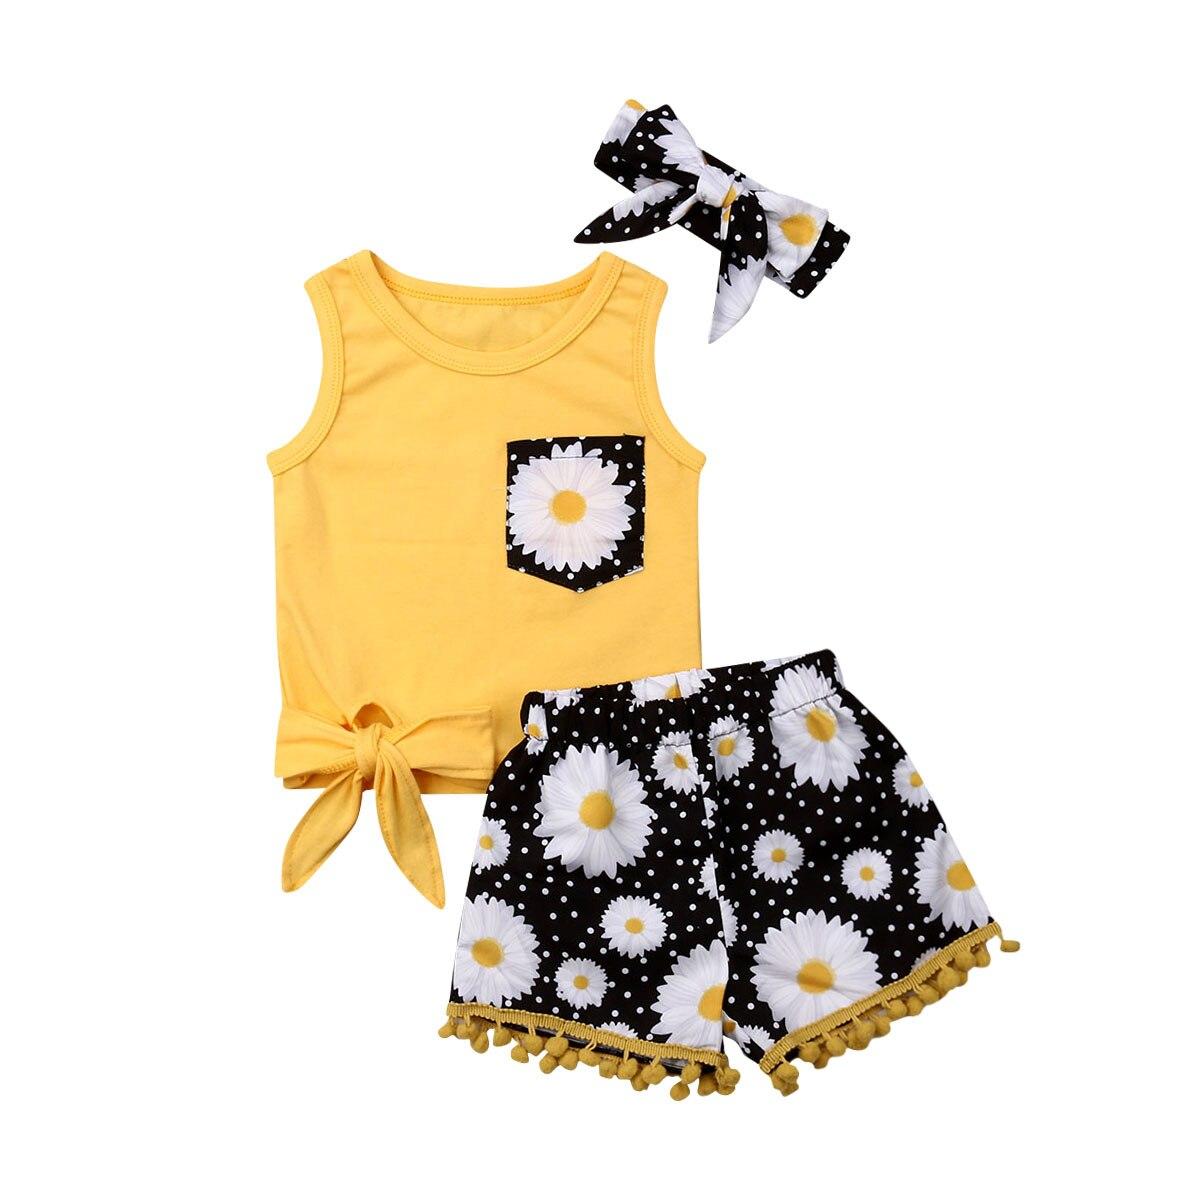 9fe92bfe3fca2 2019 Summer Kids Baby Girl Clothing Set Sleeveless Vest Tops Tassel Ball  Floral Shorts Pant Headband